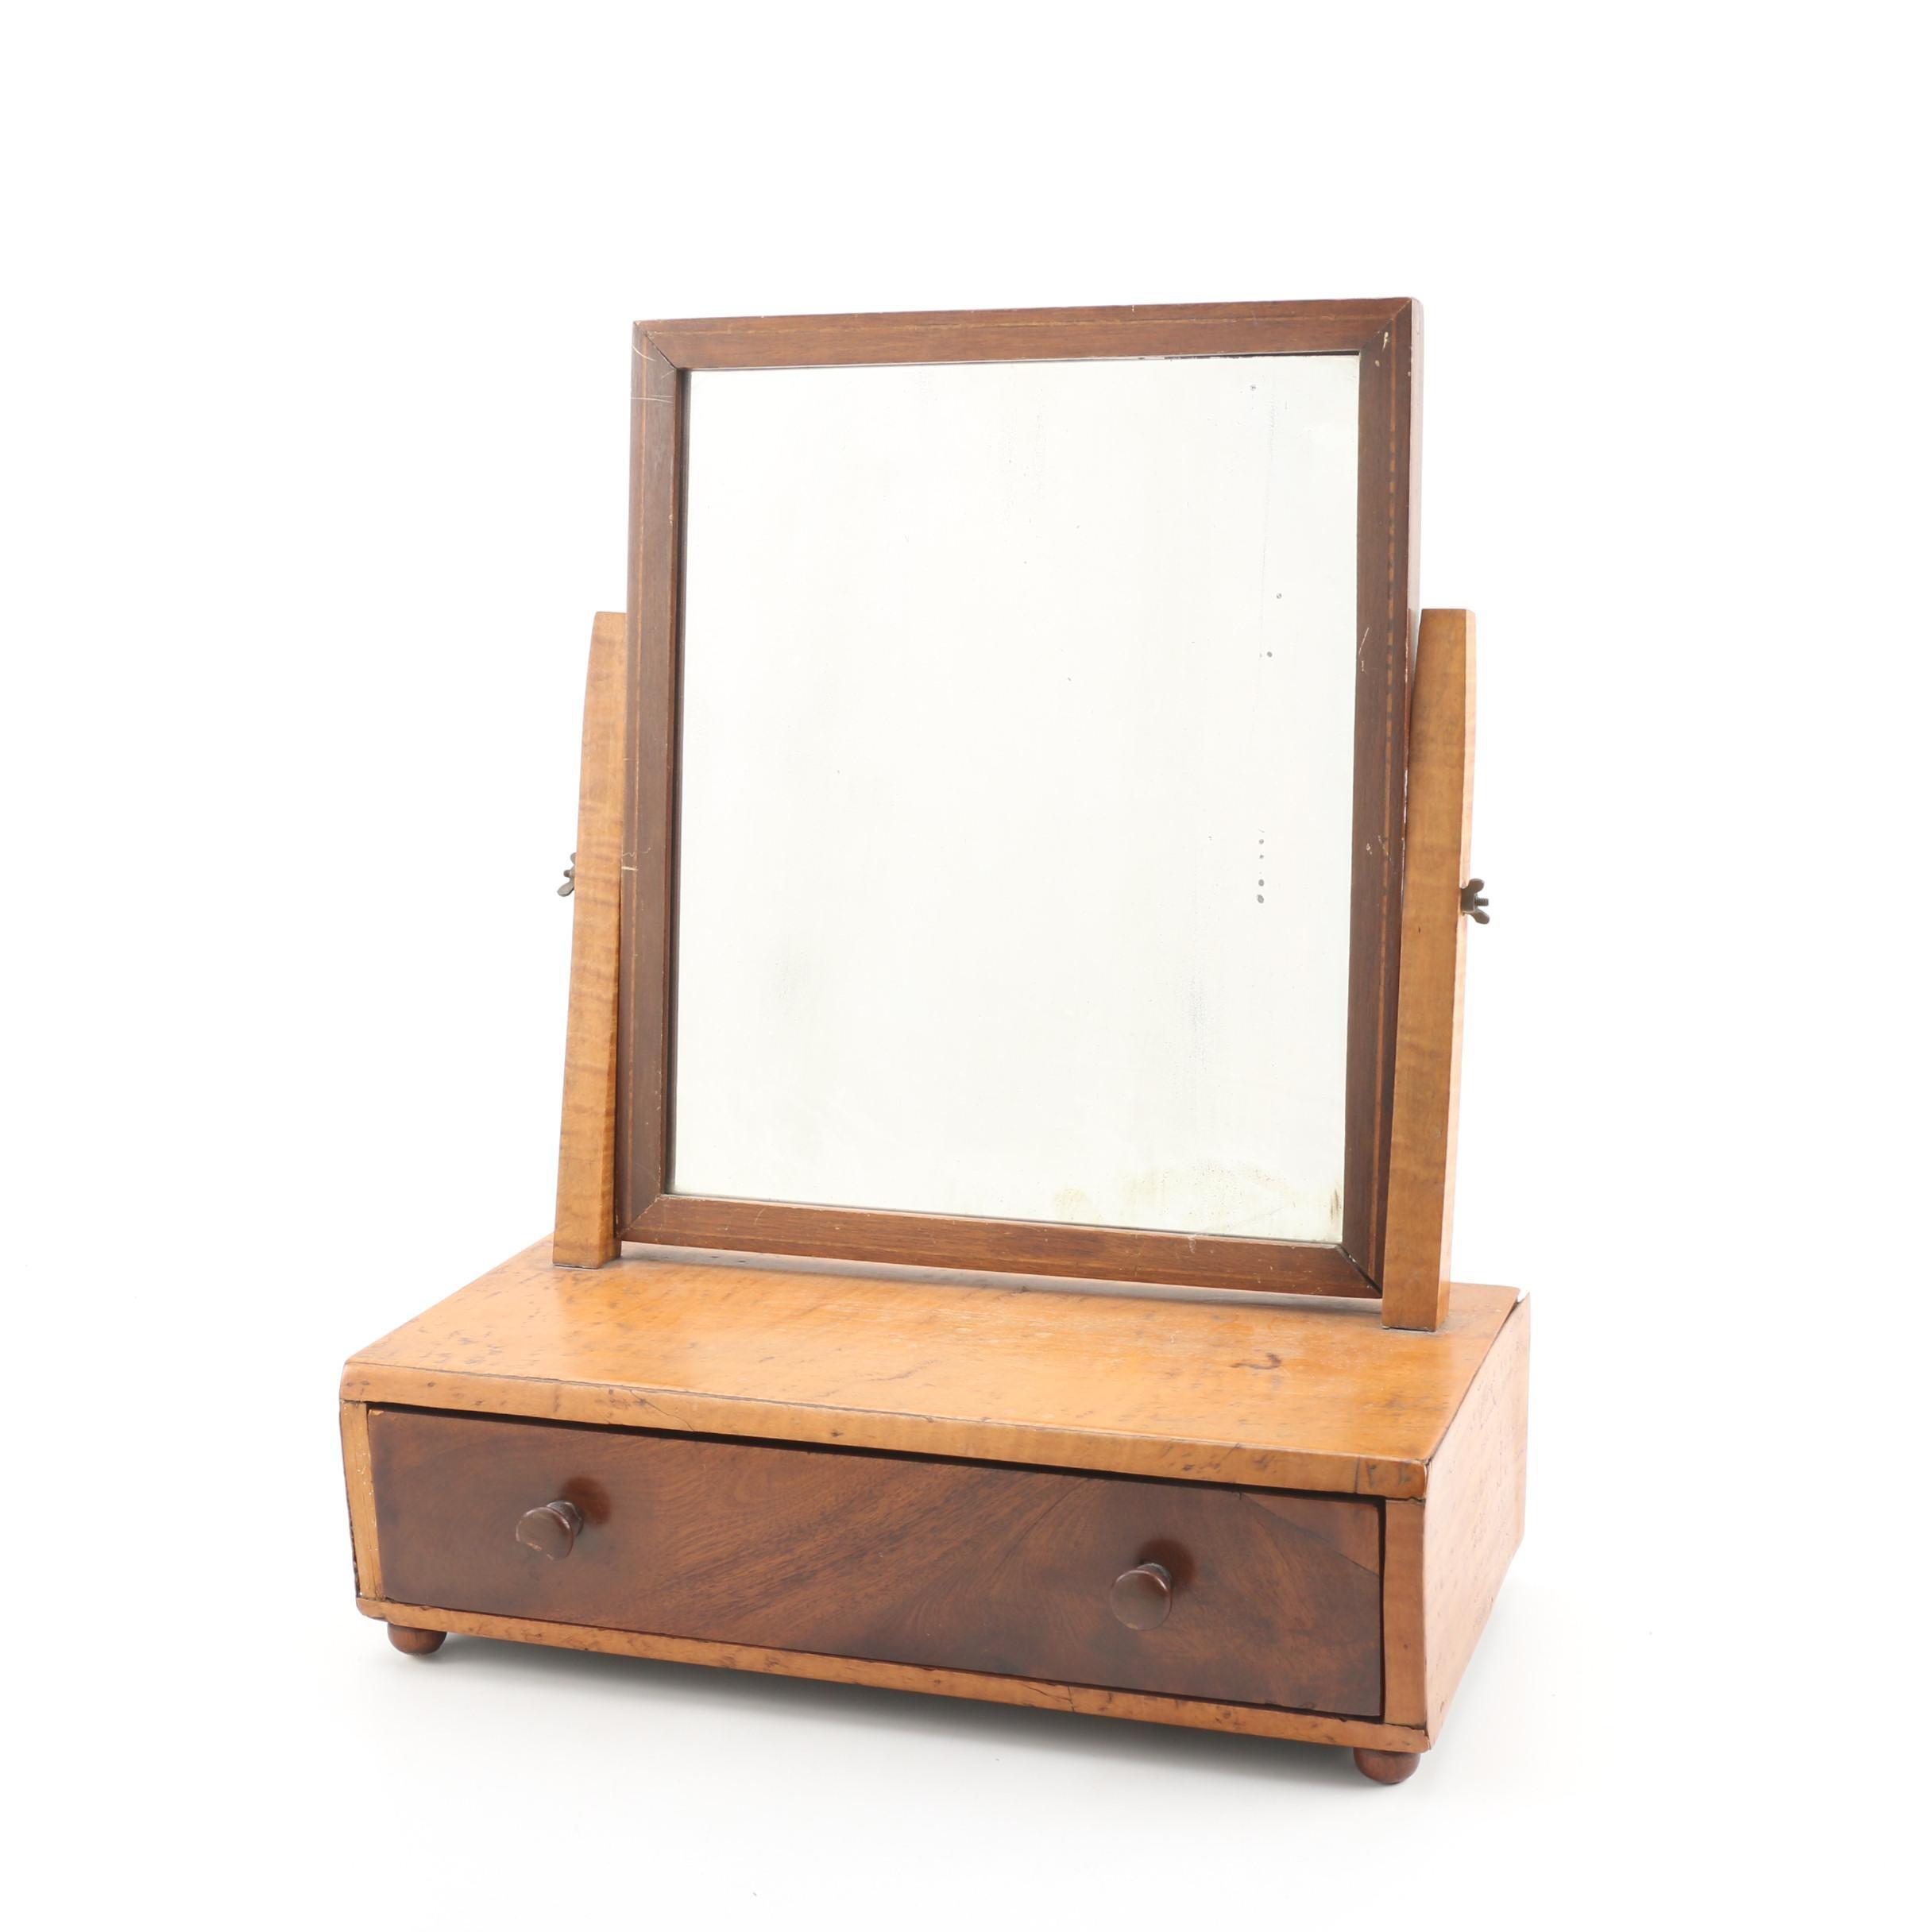 Maple and Walnut Mirrored Shaving Stand, 19th Century